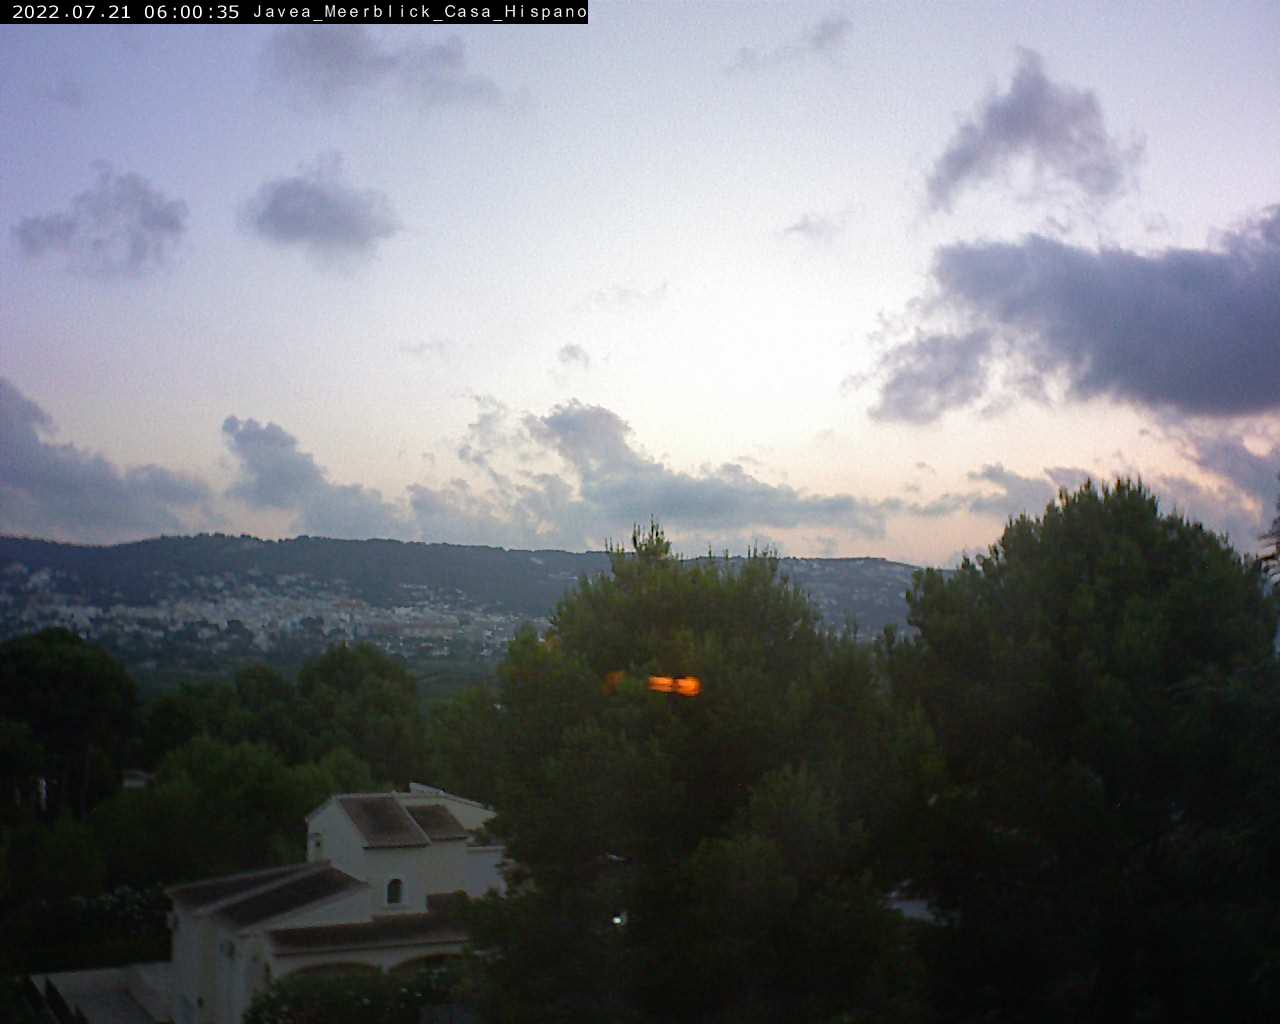 Jávea (Xàbia) – Casa Hispano – Blick zum Cap de San Antonio und zum Meer webcam Live